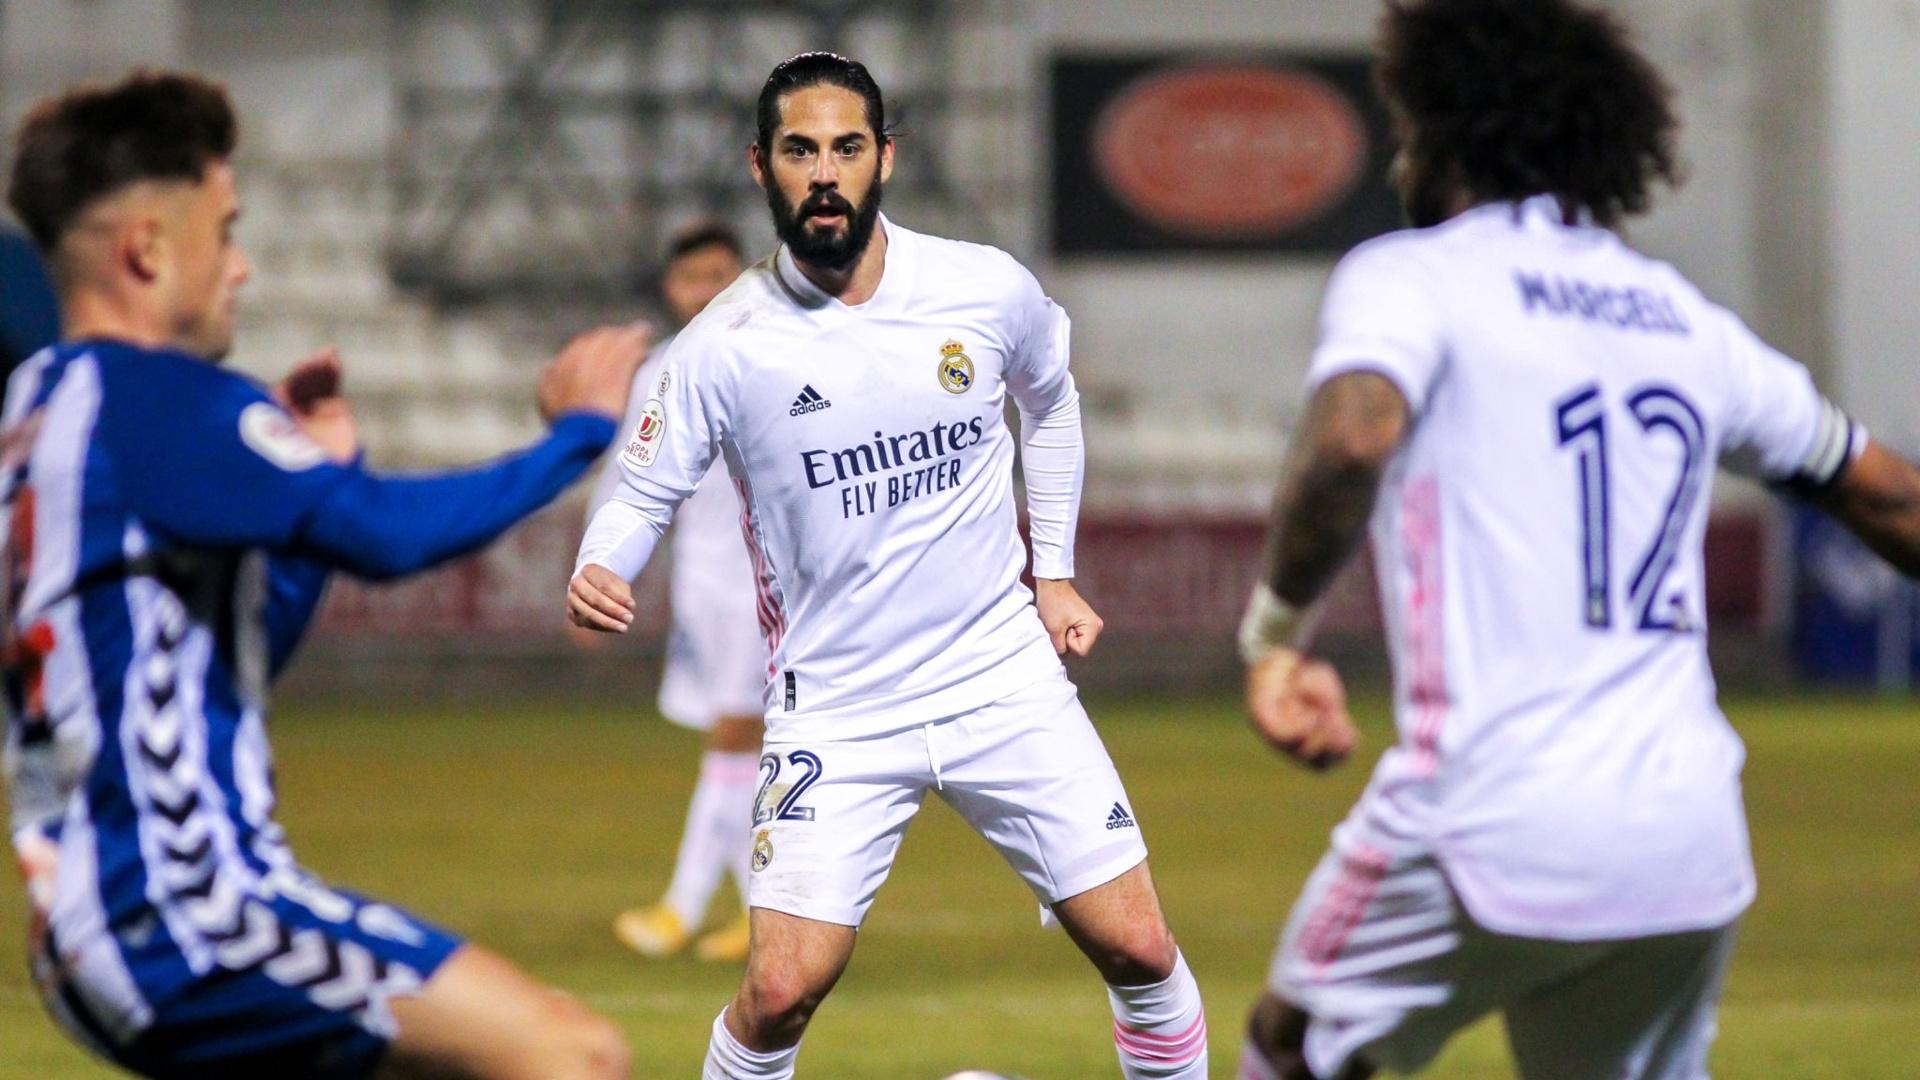 Match Report: CD Alcoyano 2-1 Real Madrid